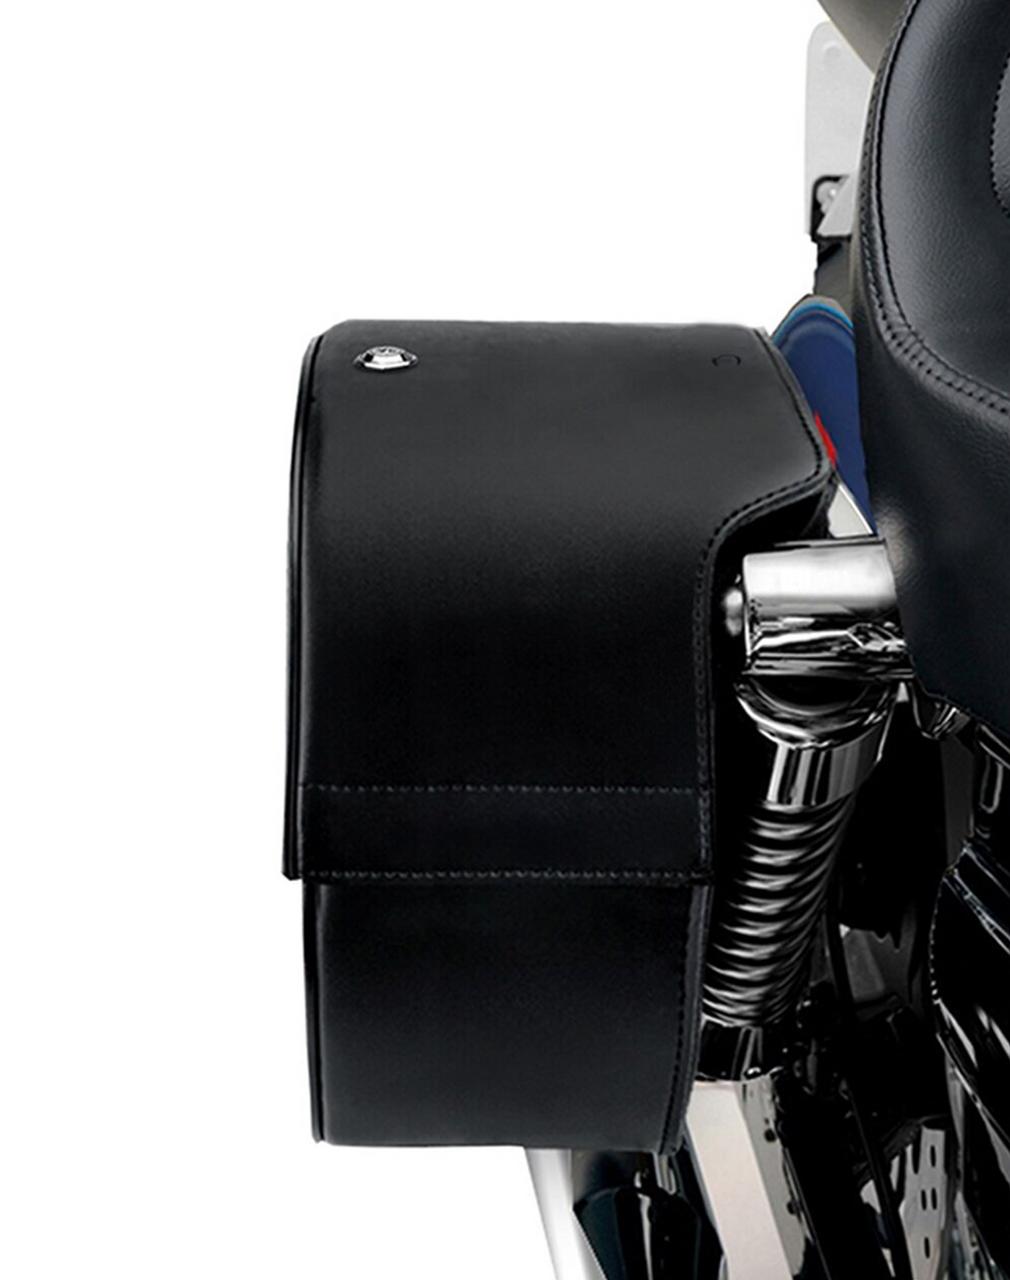 Honda 1500 Valkyrie Interstate Vikingbags Shock Cutout Slanted Large Leather Motorcycle Saddlebags Shock Cutout View